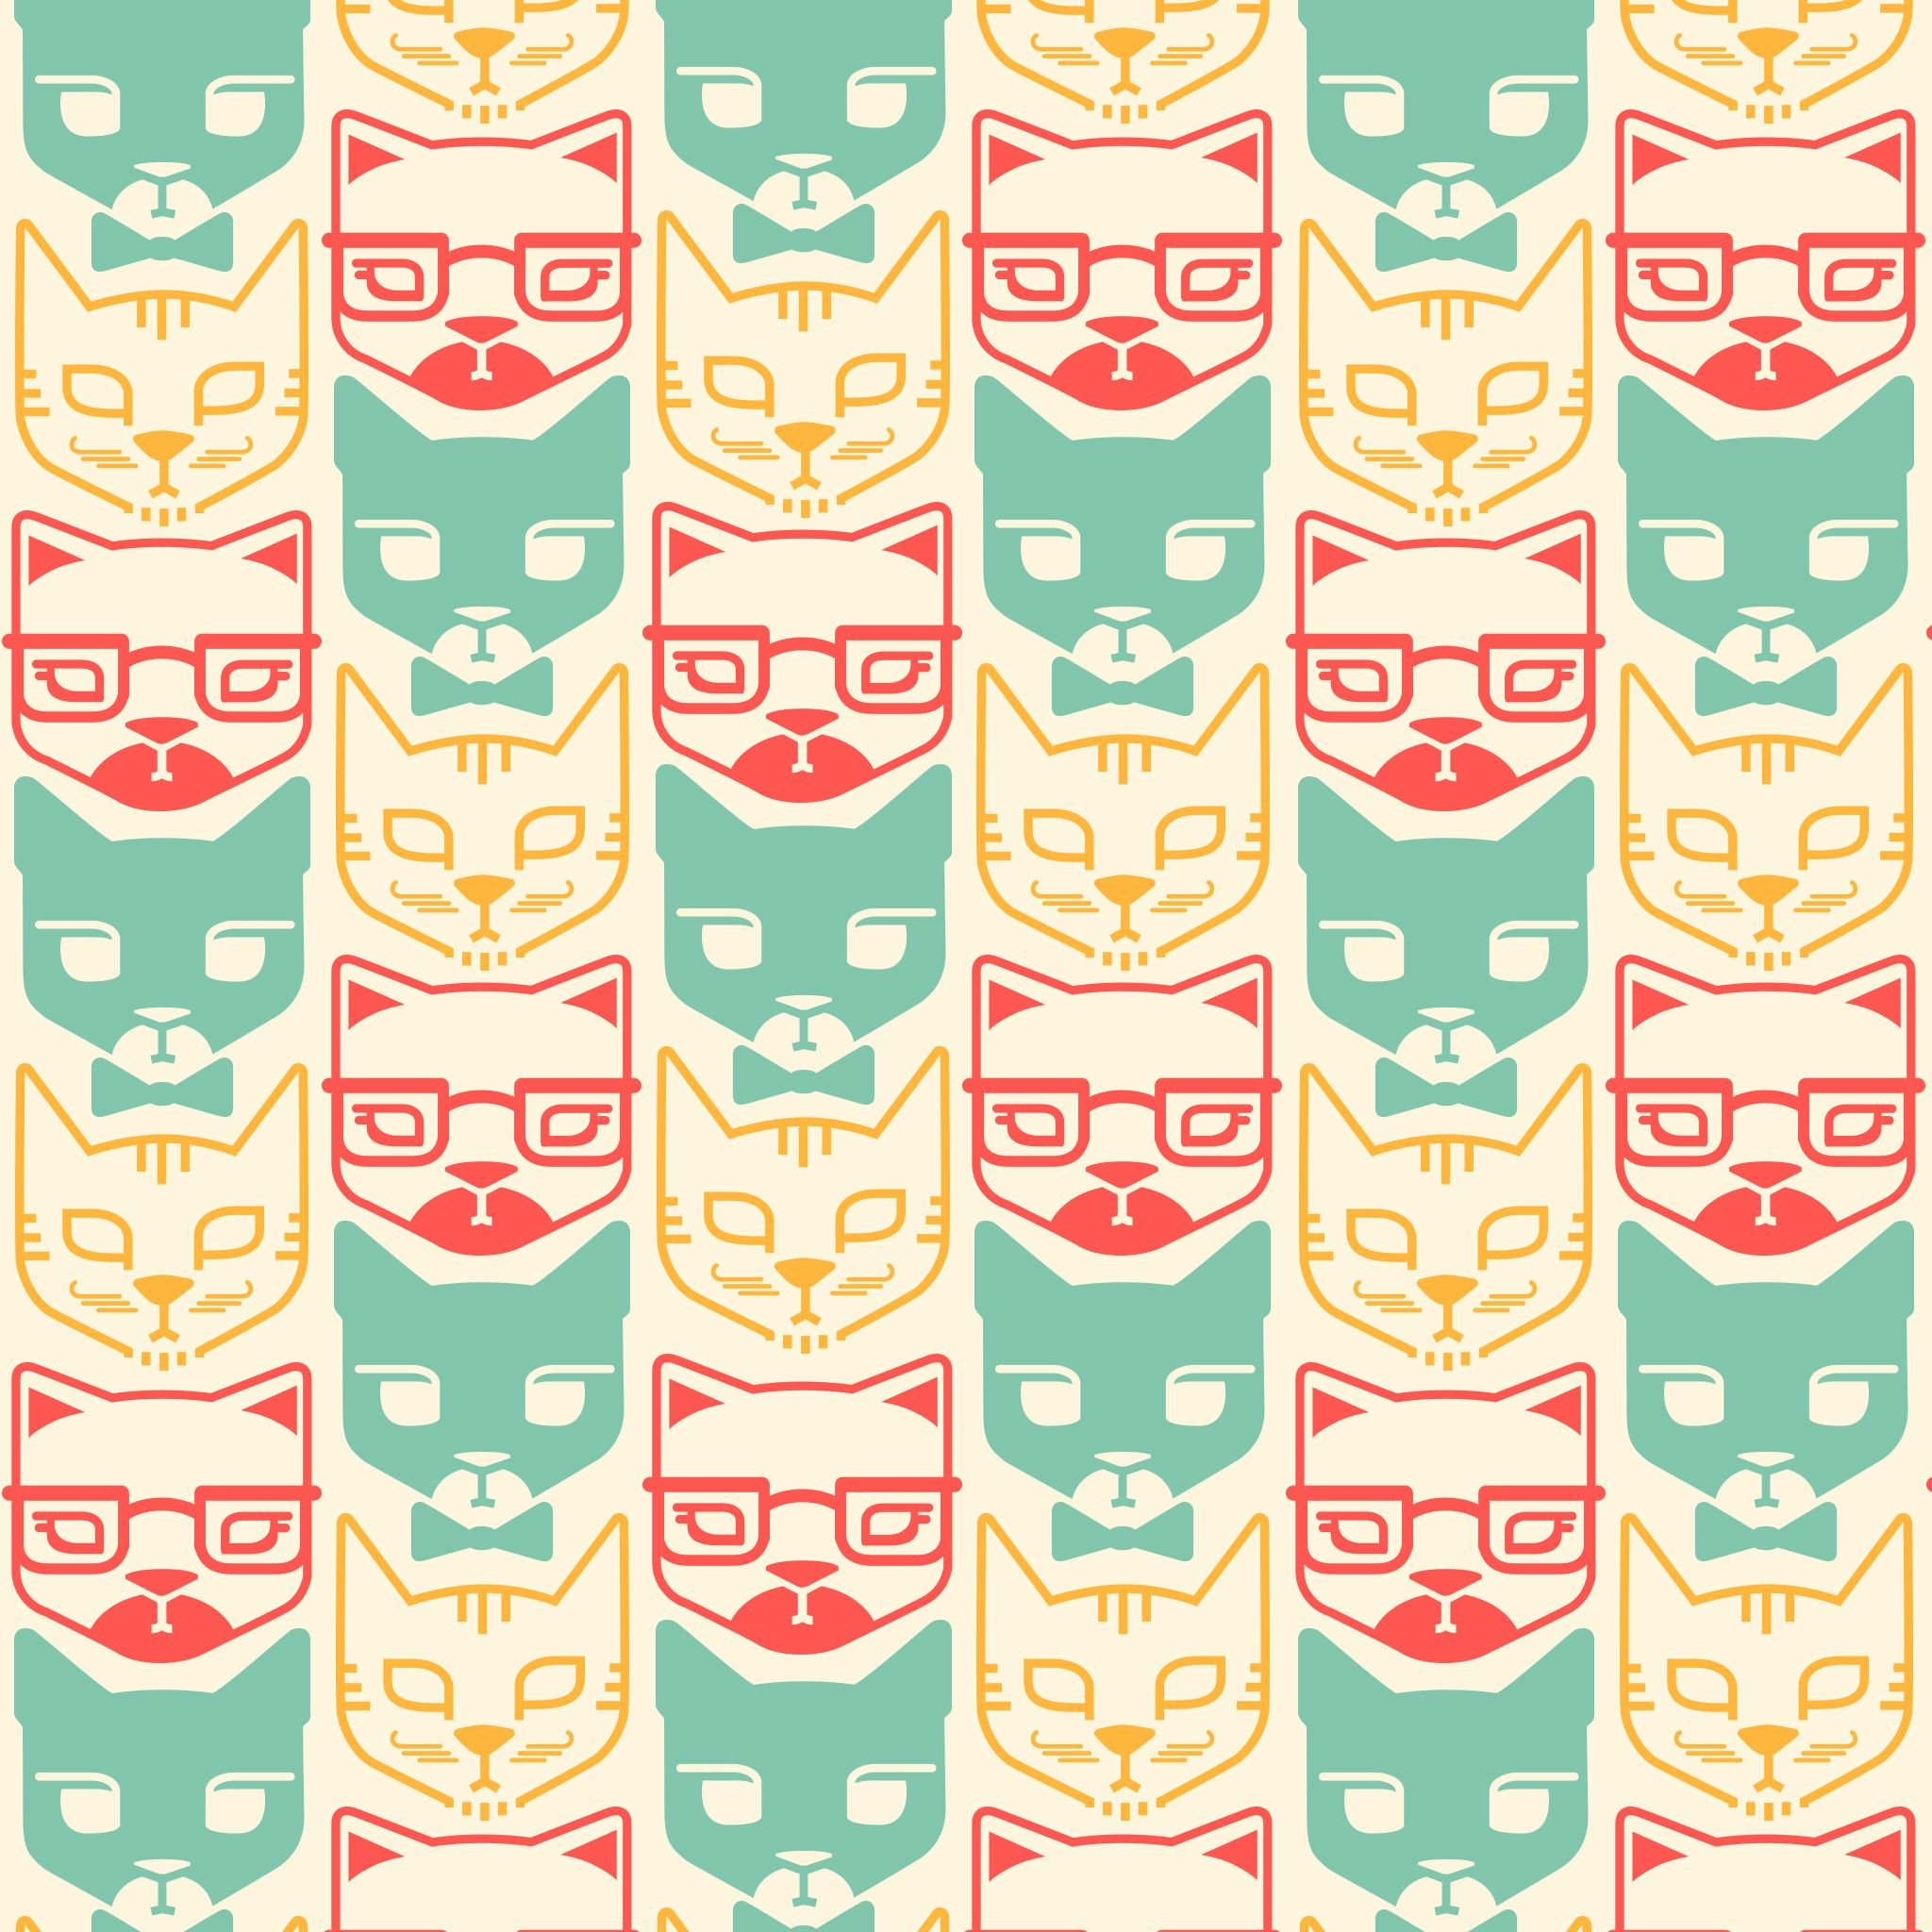 cat pattern iphone wallpaper 69679 trendnet